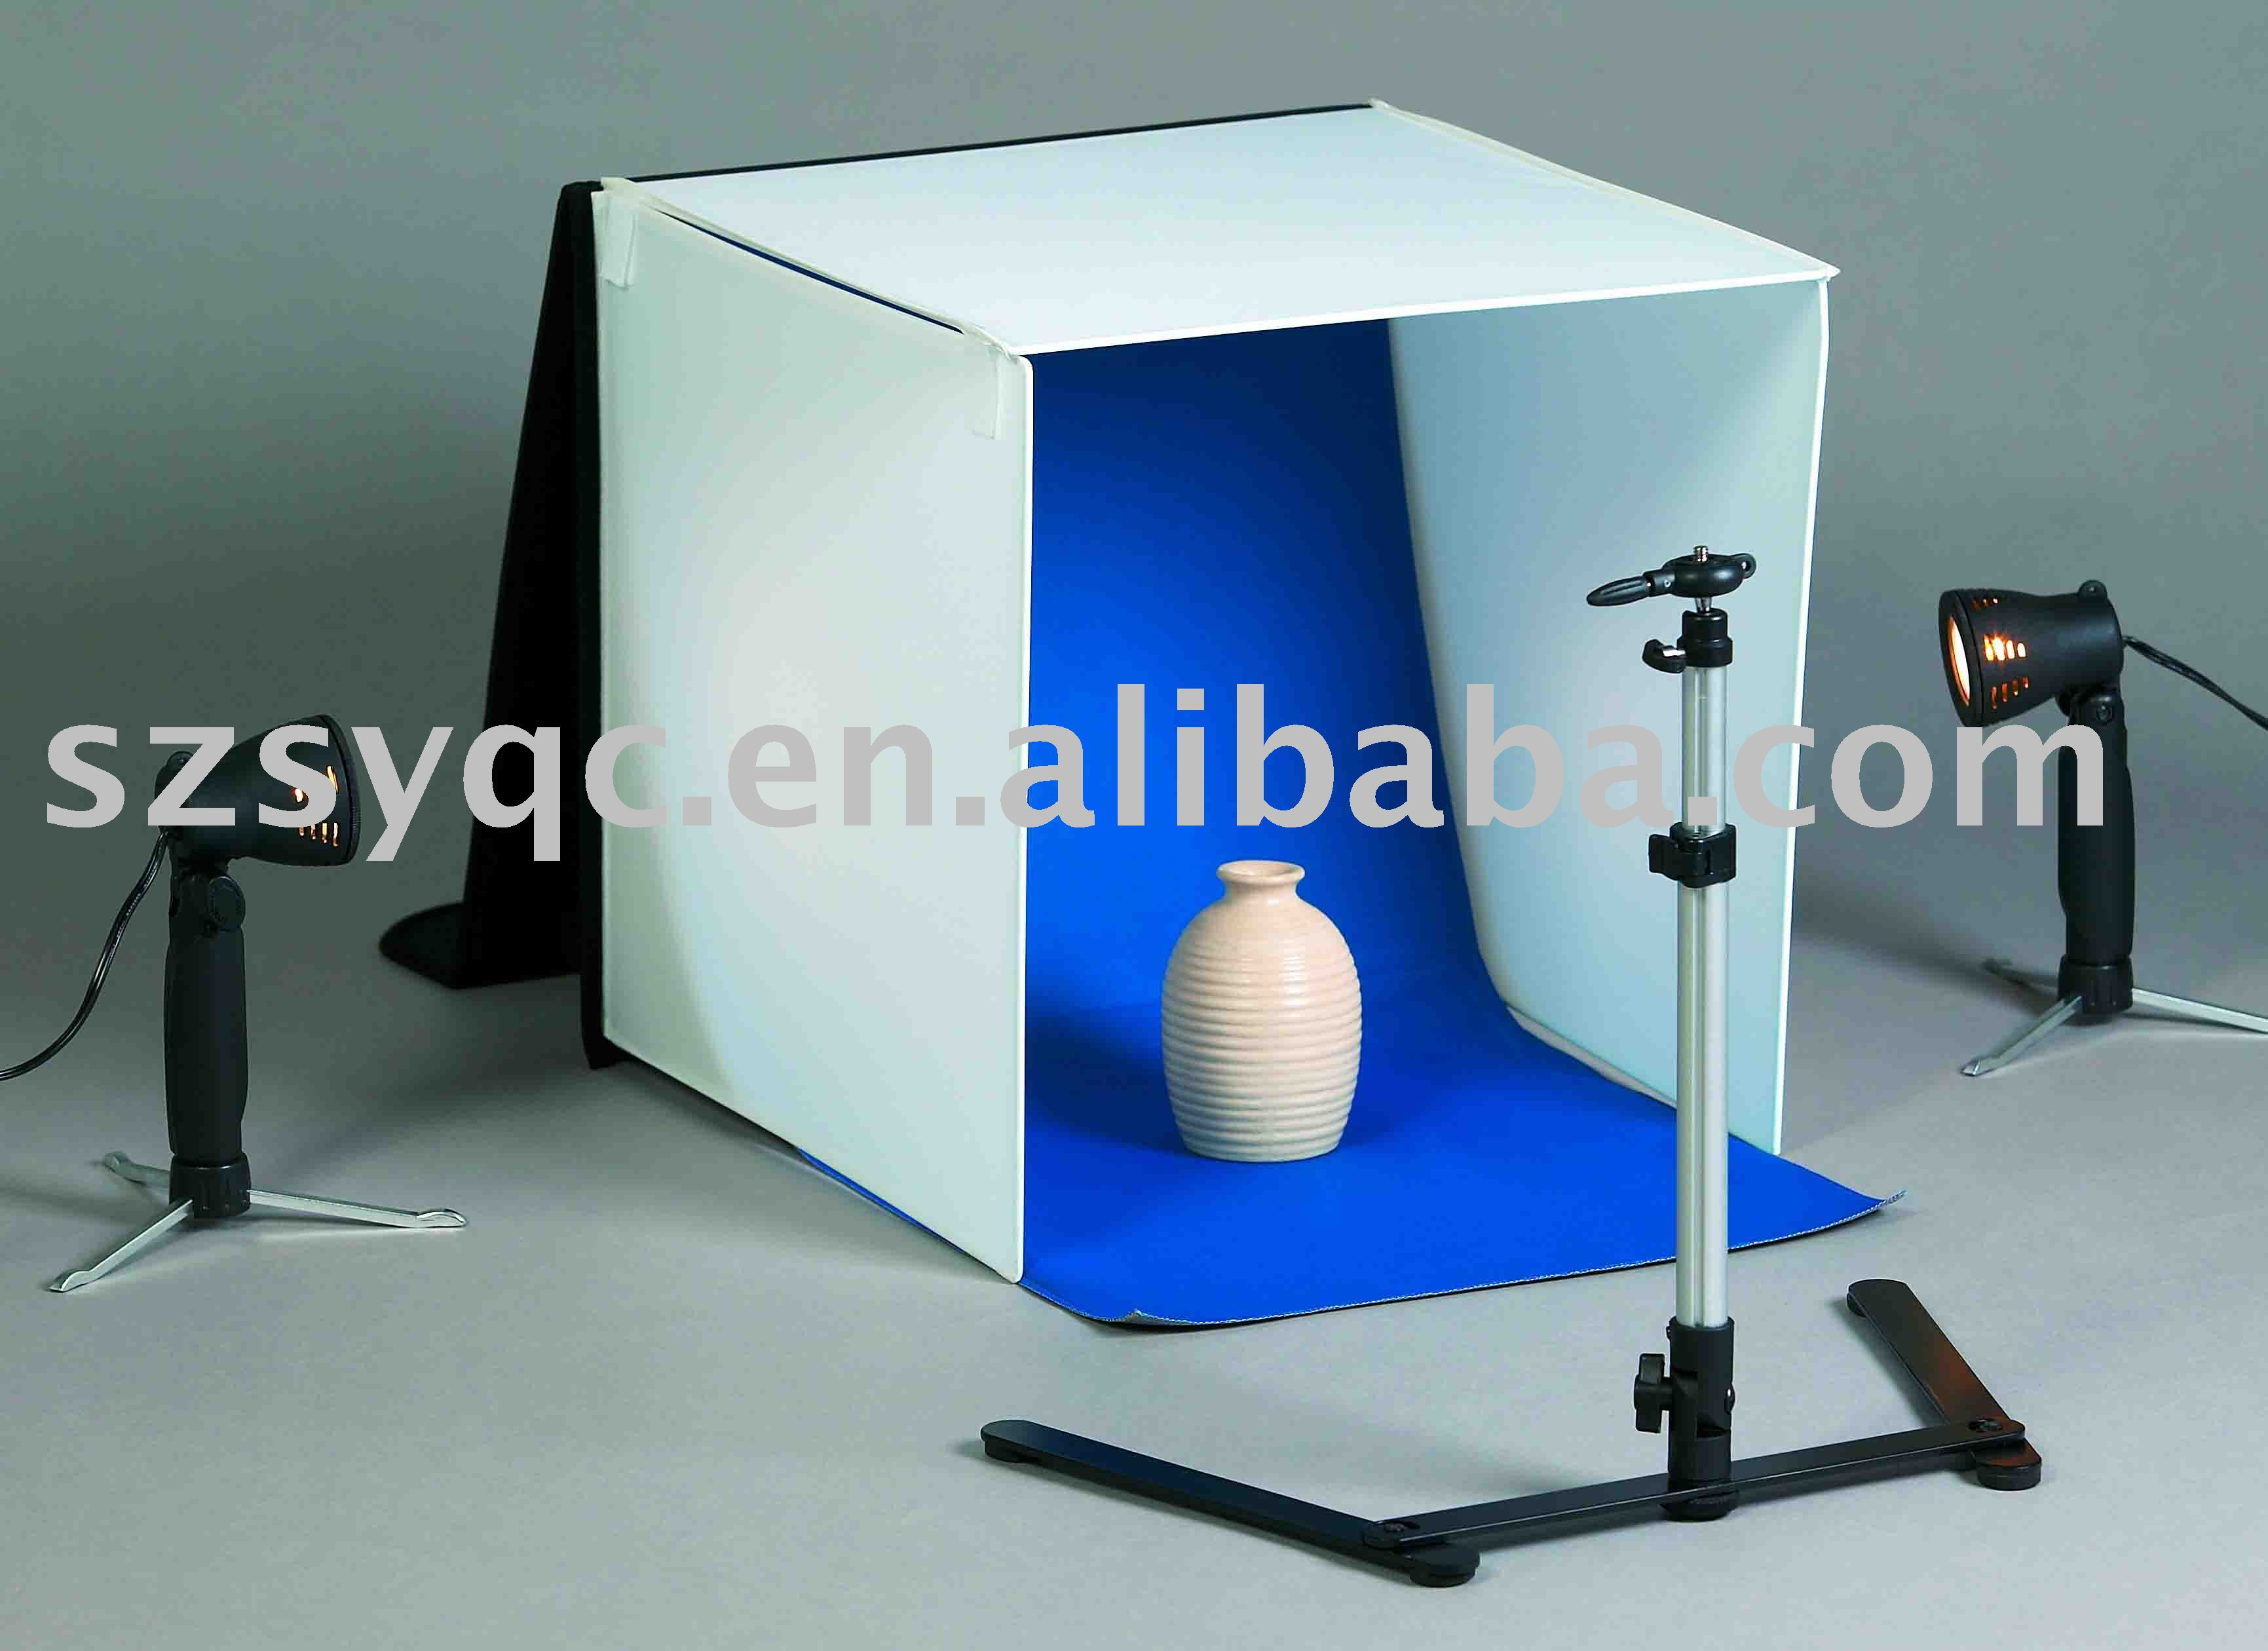 Mini Studio Light Kit 50x50x50cm Buy Studio Lightstudio Lighting Kit